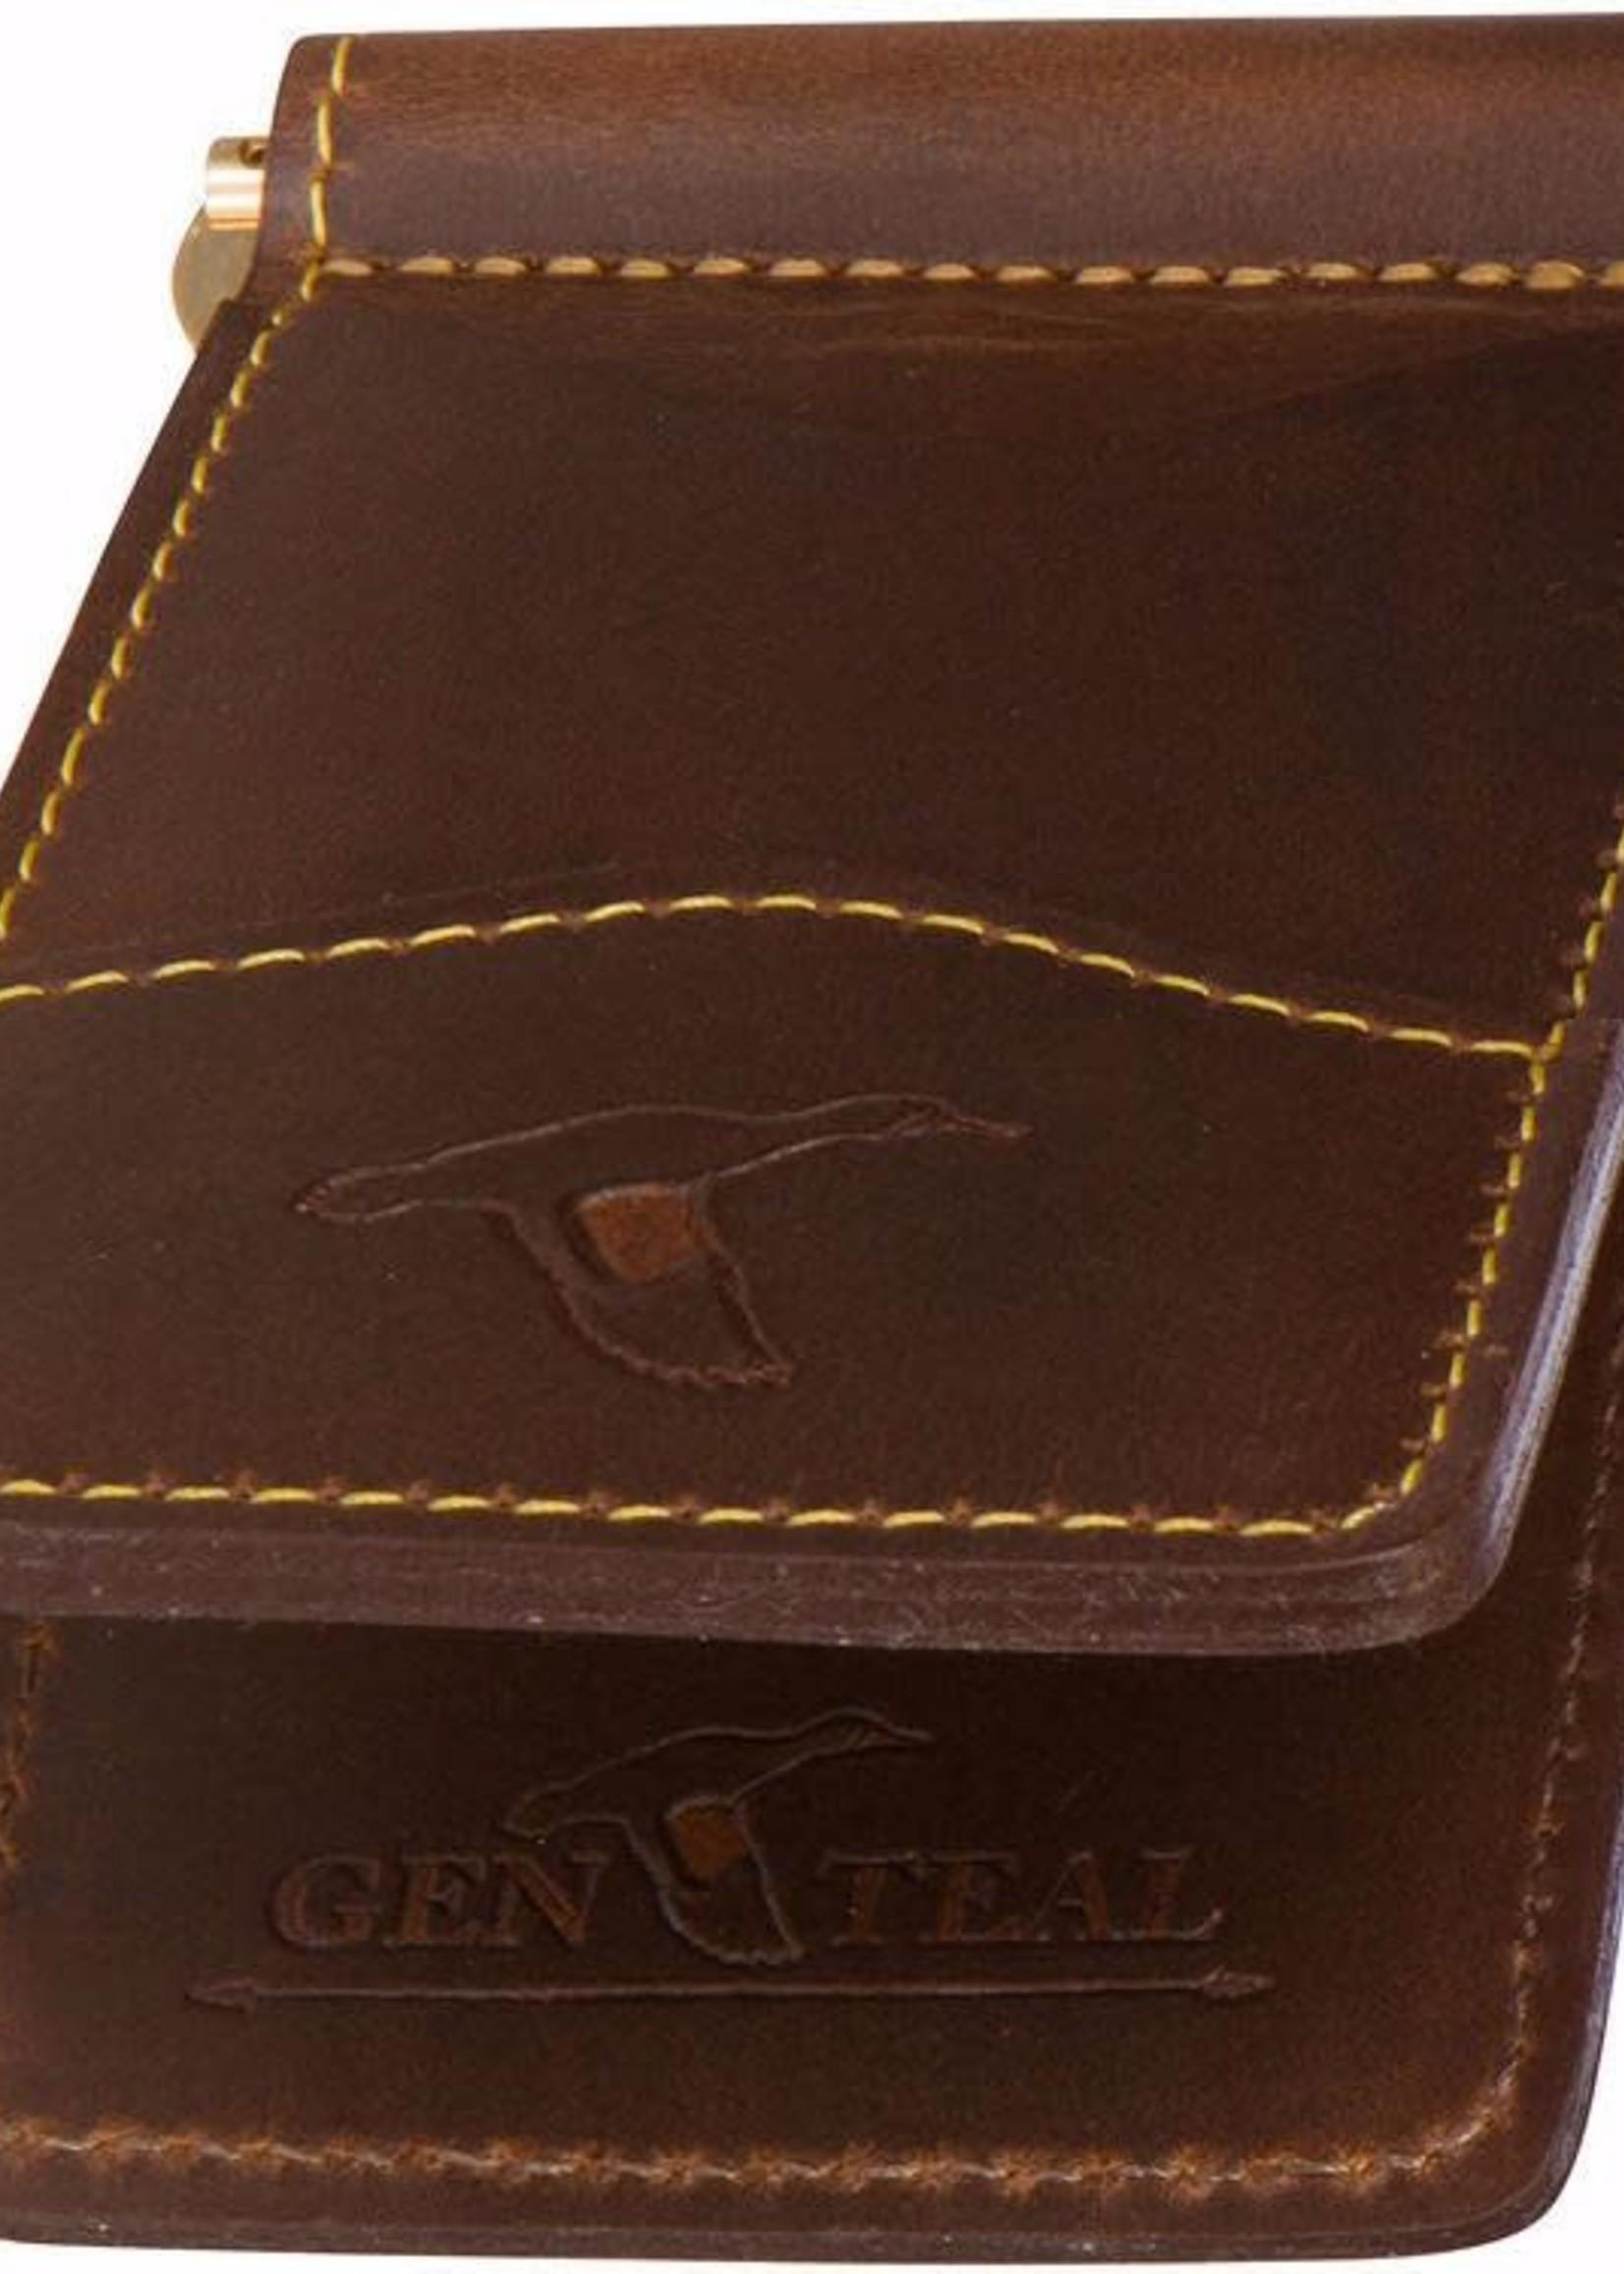 GenTeal Apparel Genteal Wallet